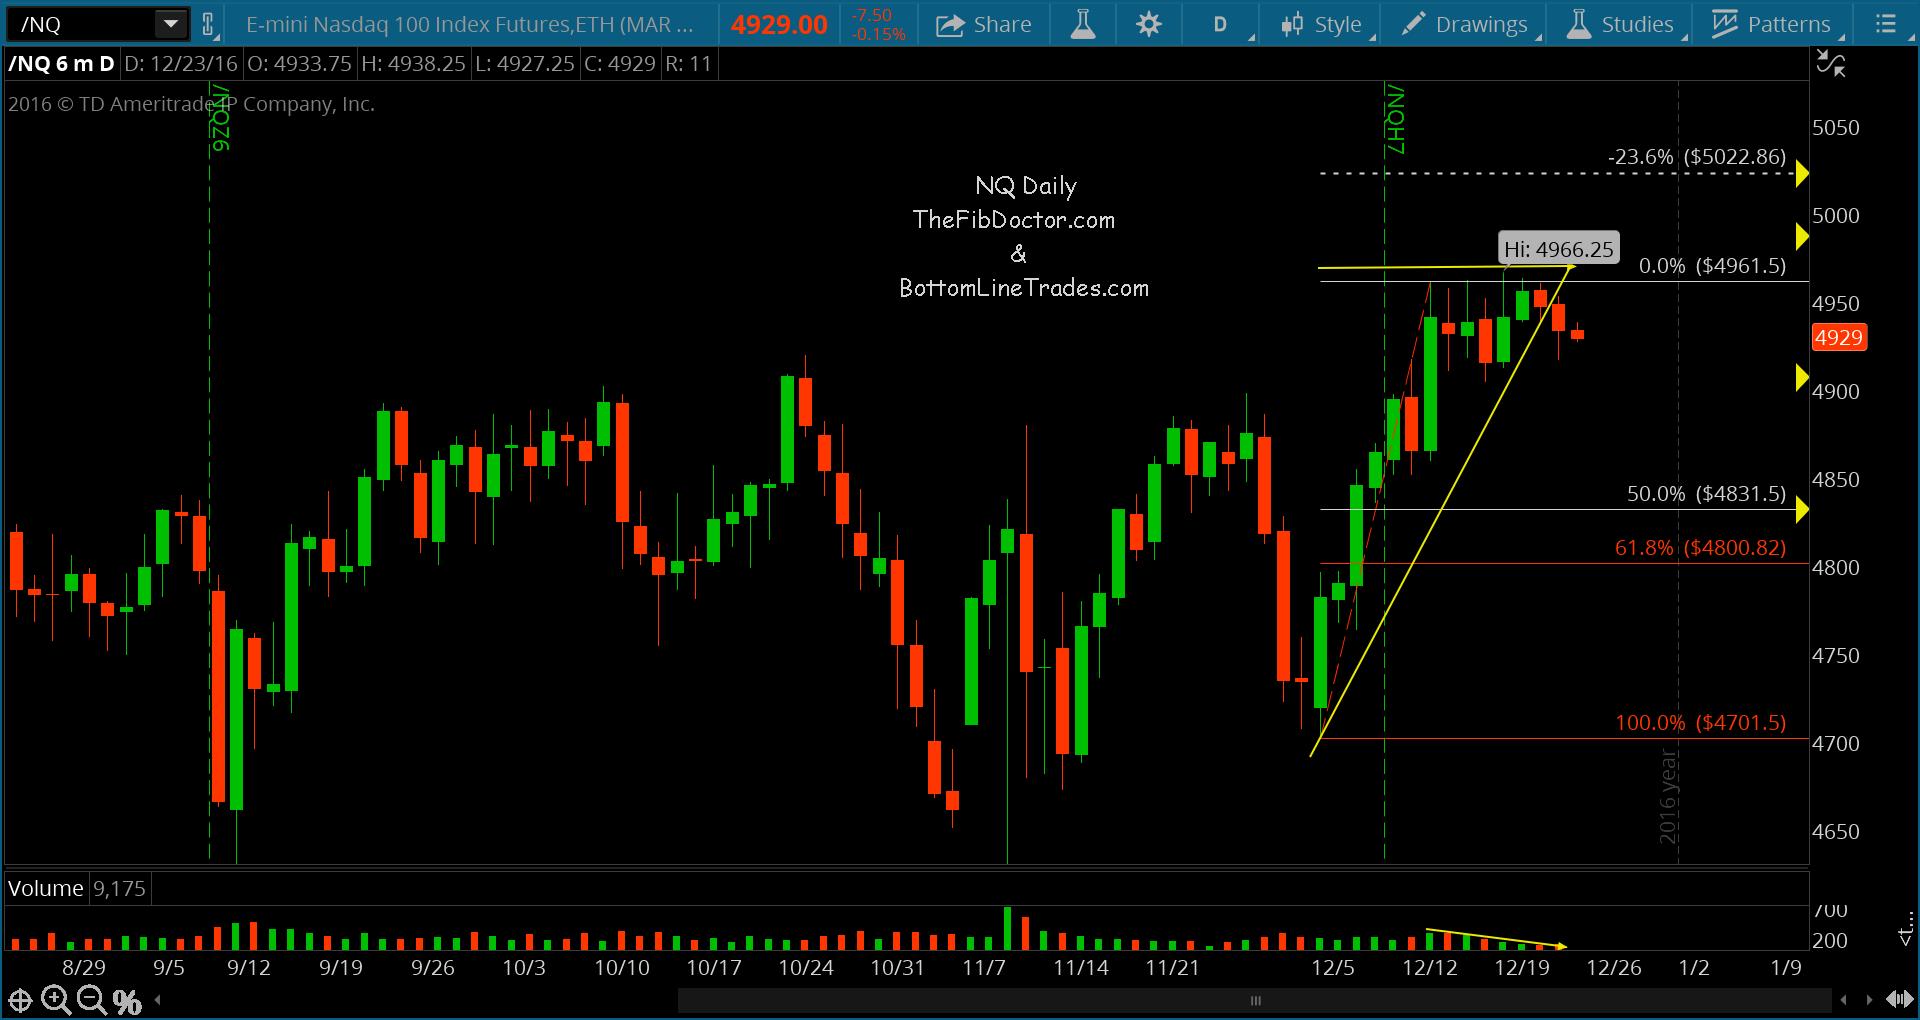 nq-nasdaq-futures-chart-analysis-ascending-wedge-broken-12-23-16